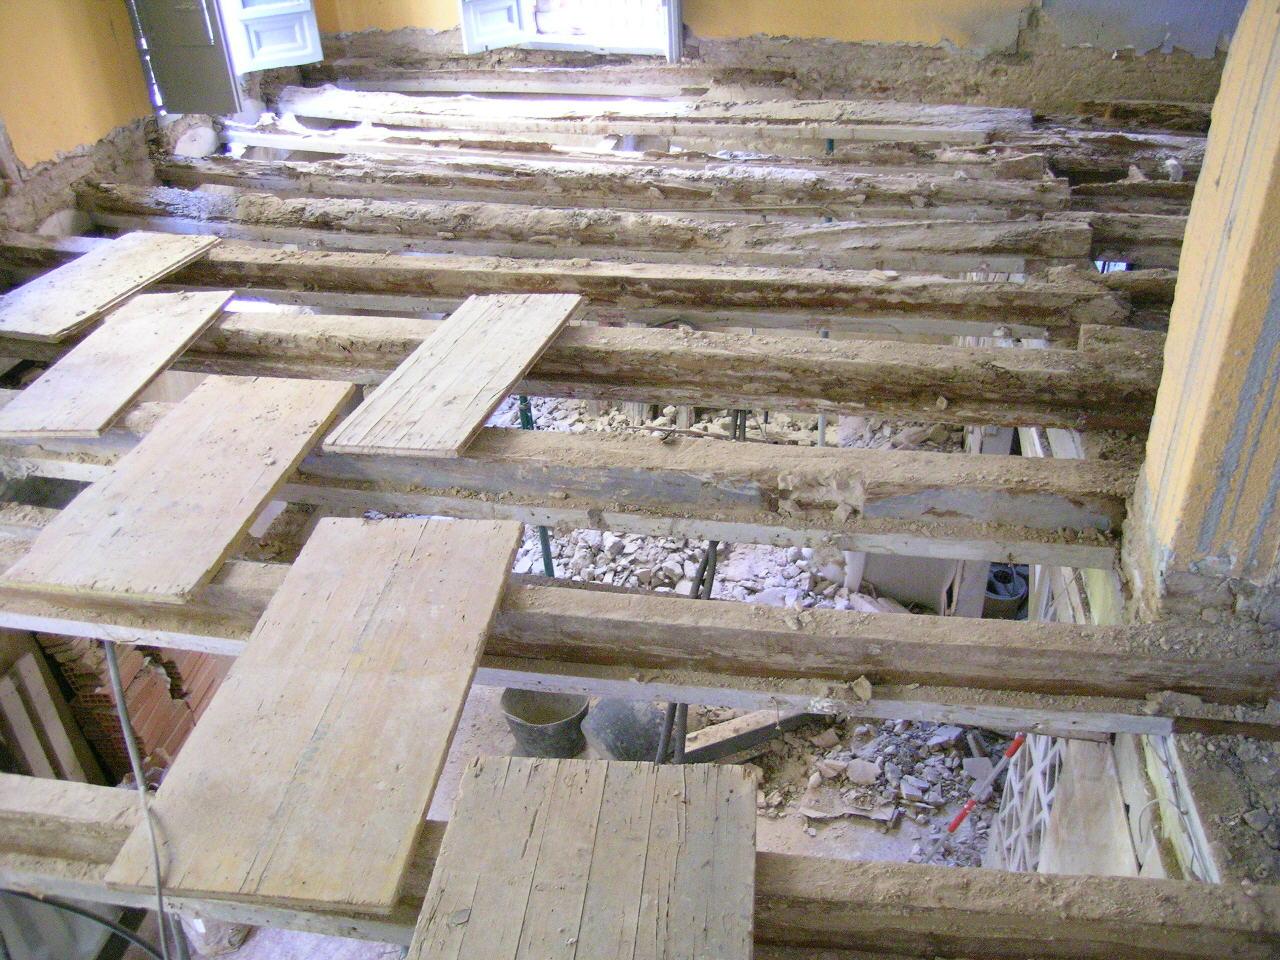 Bosco hurtado arquitecto refuerzo estructural - Como hacer un piso de hormigon lustrado ...